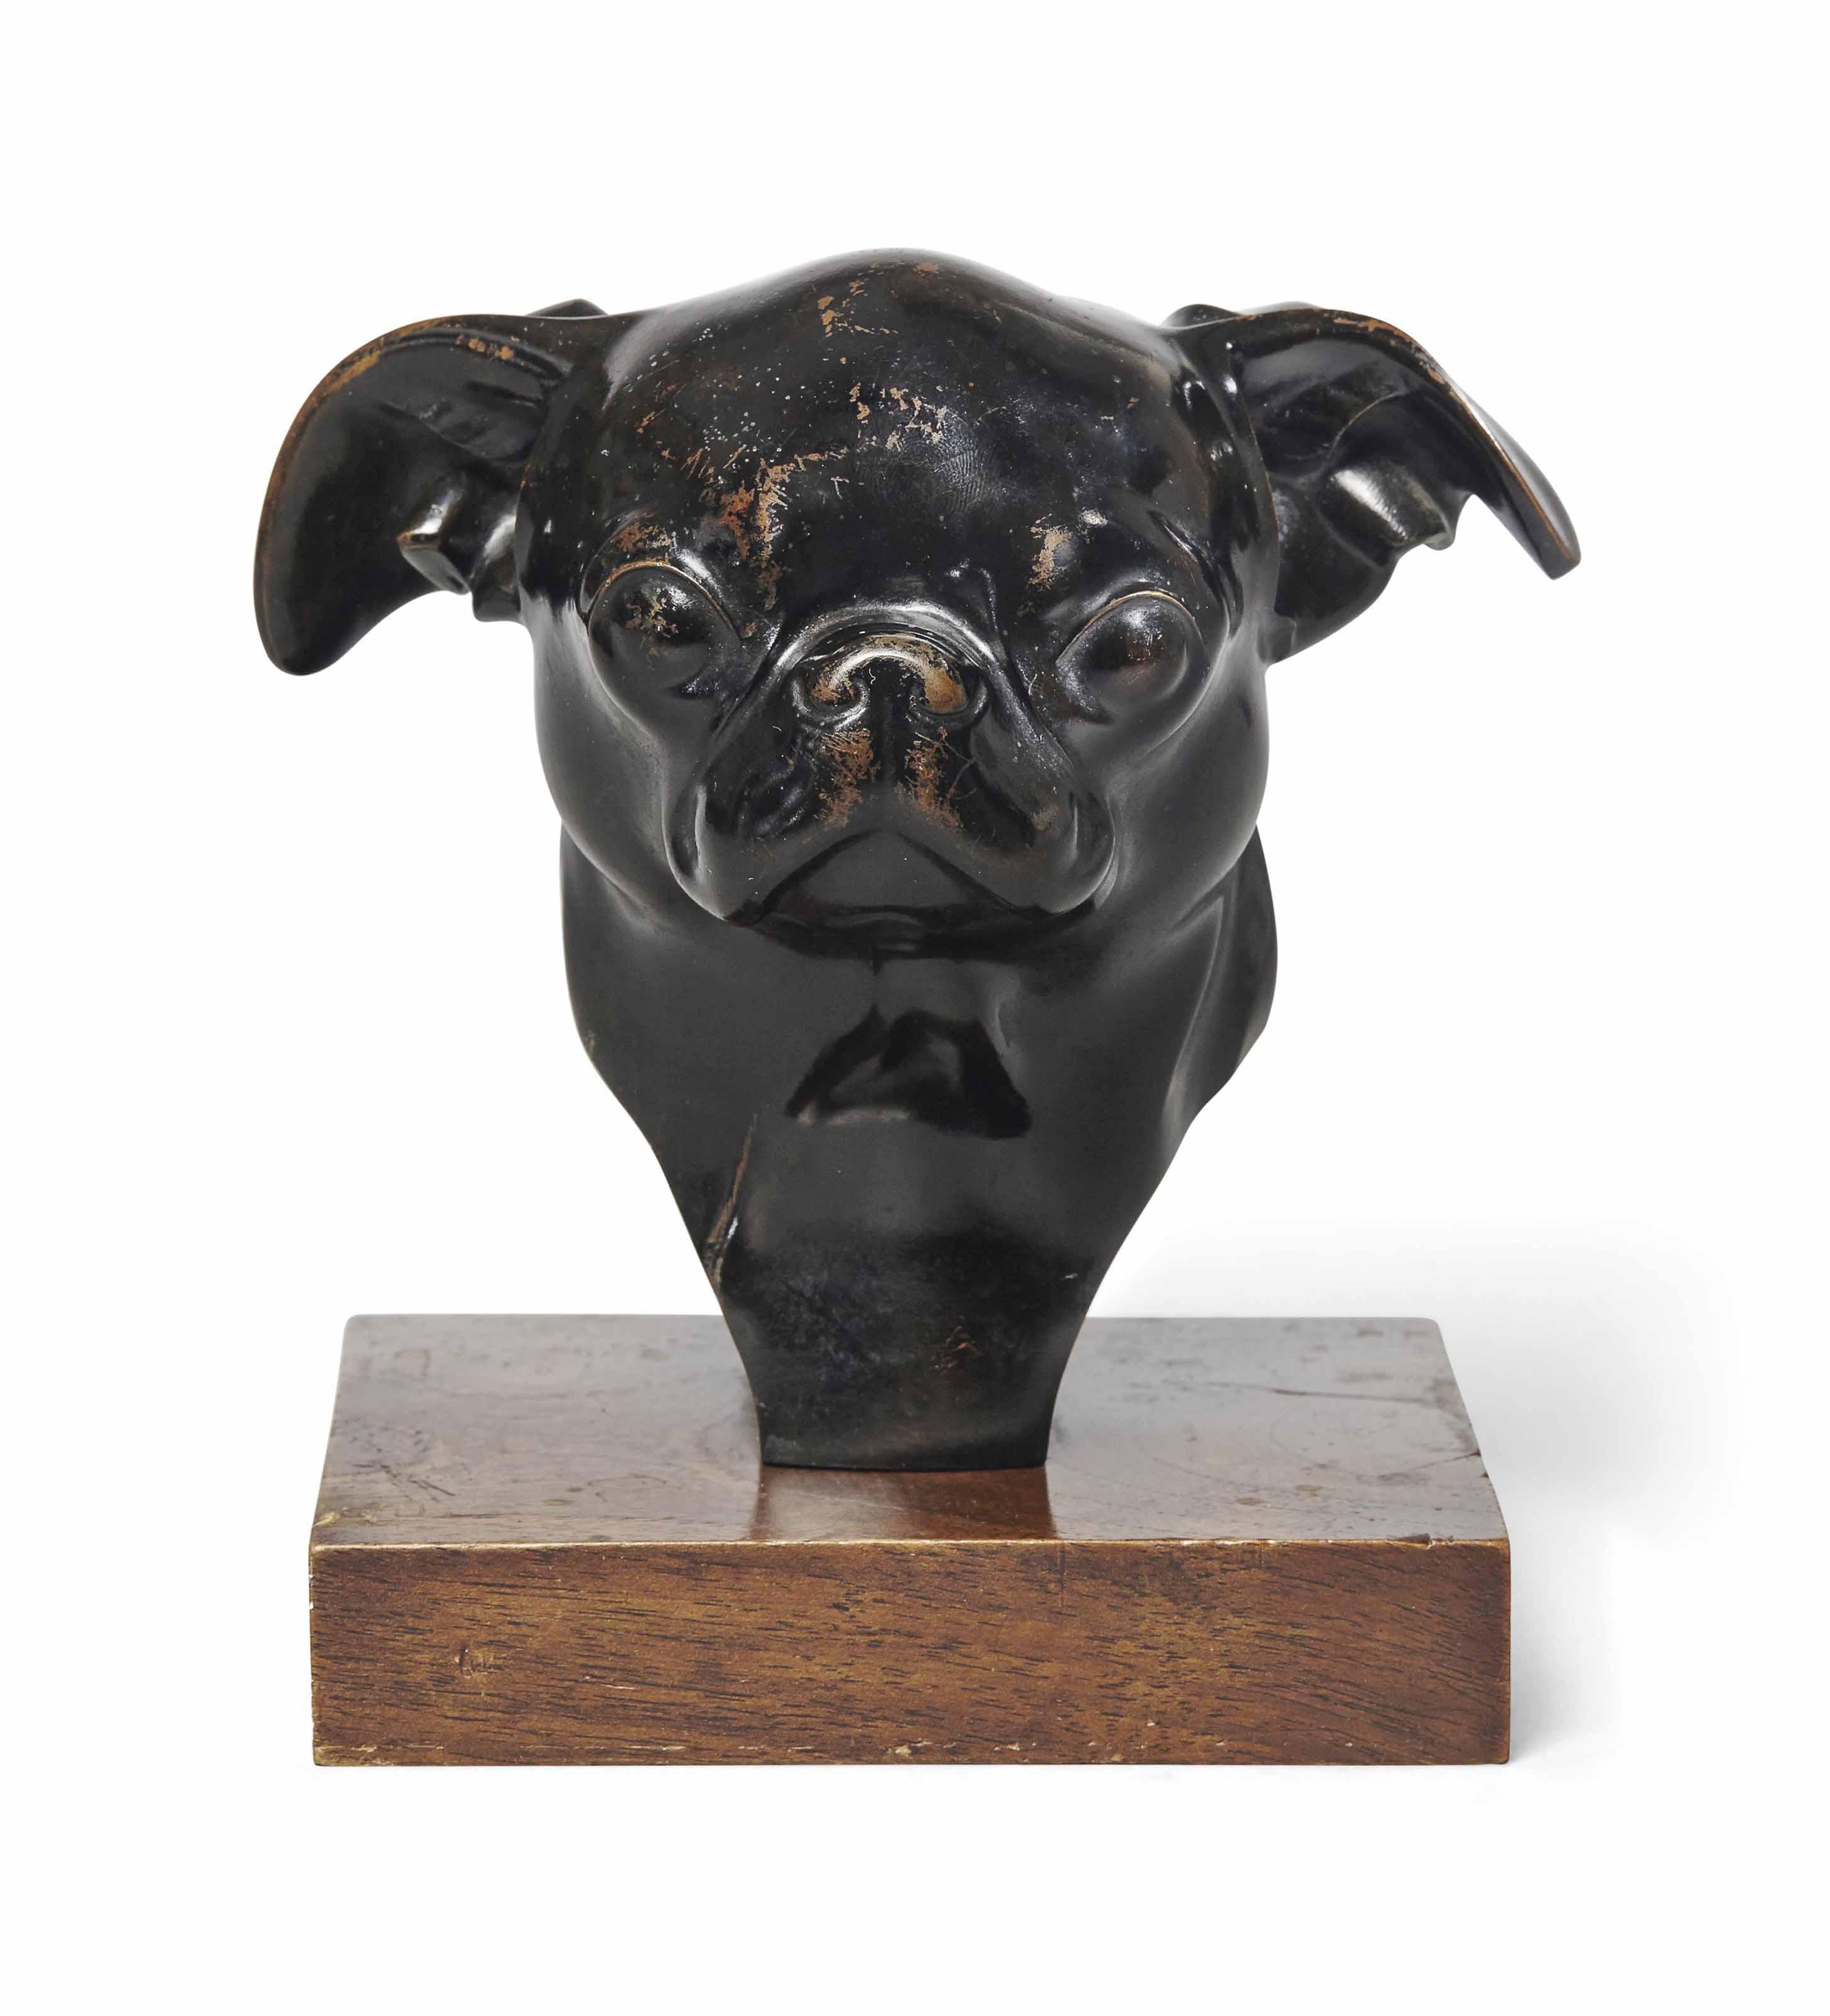 Jean-Louis Vuilleumier (1899-1